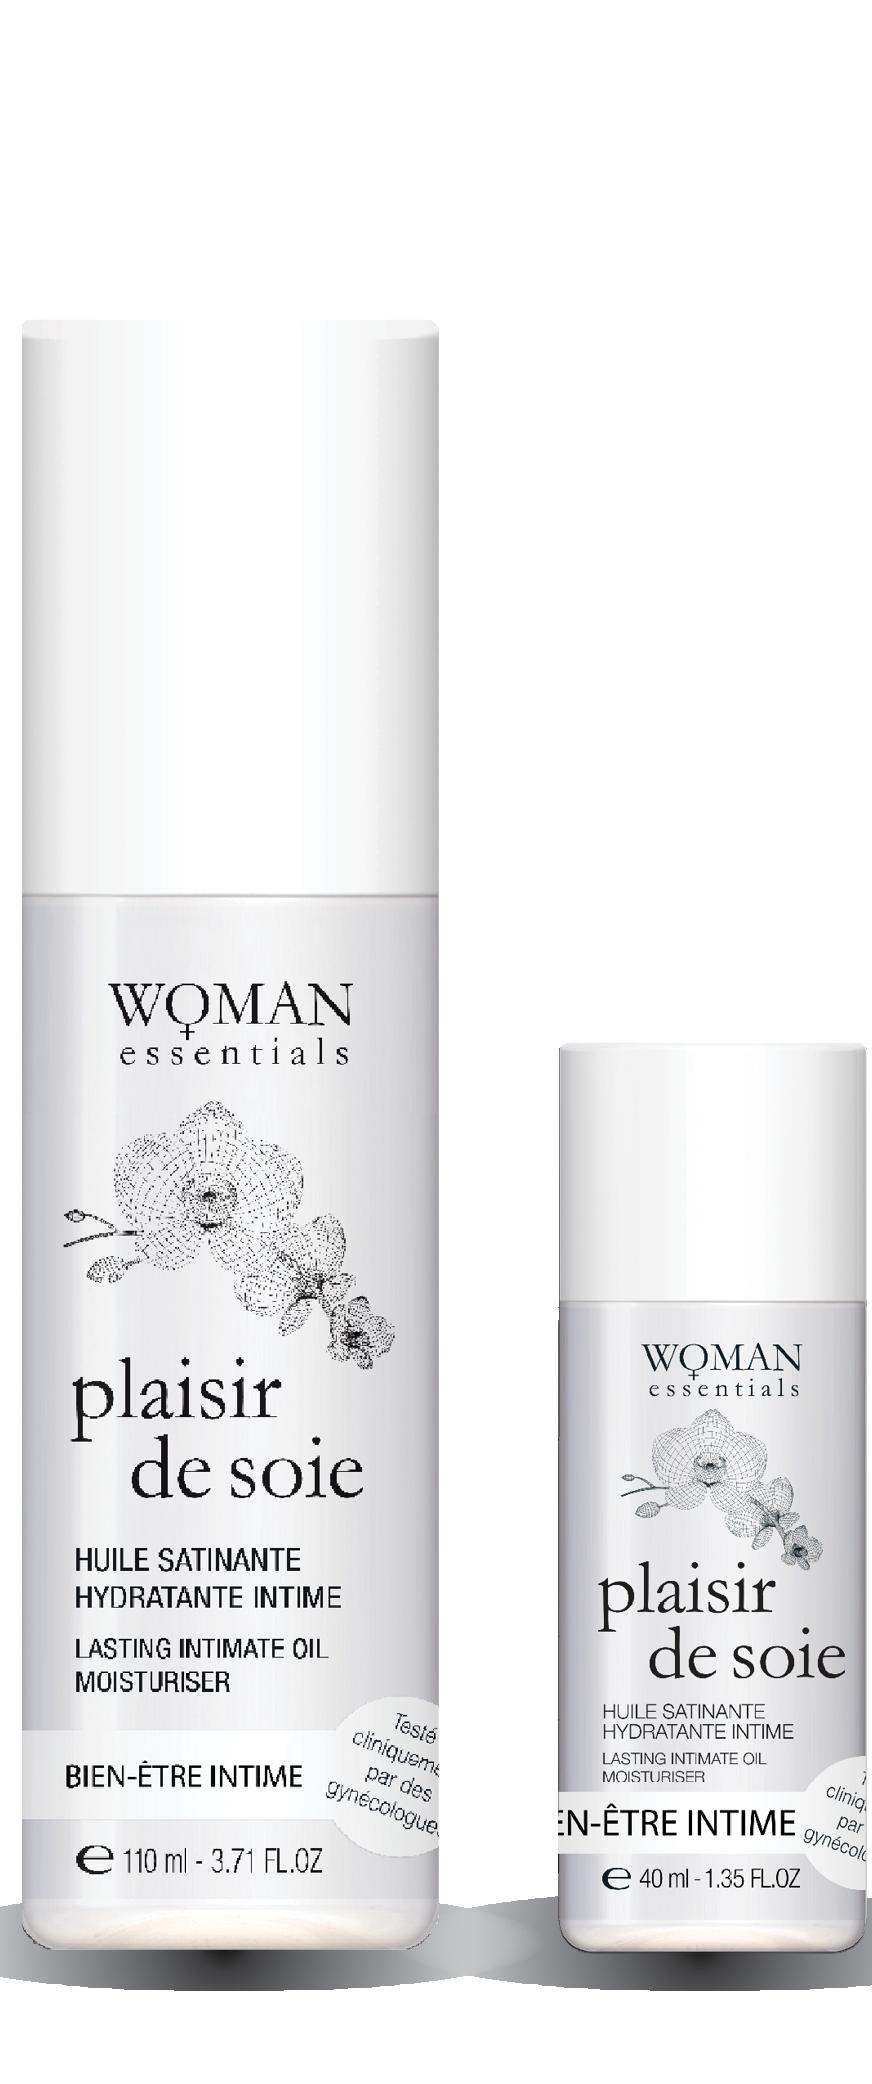 woman essential massaging oil intimate lubricant plaisir silicone lube moisturiser vulva gel dryness